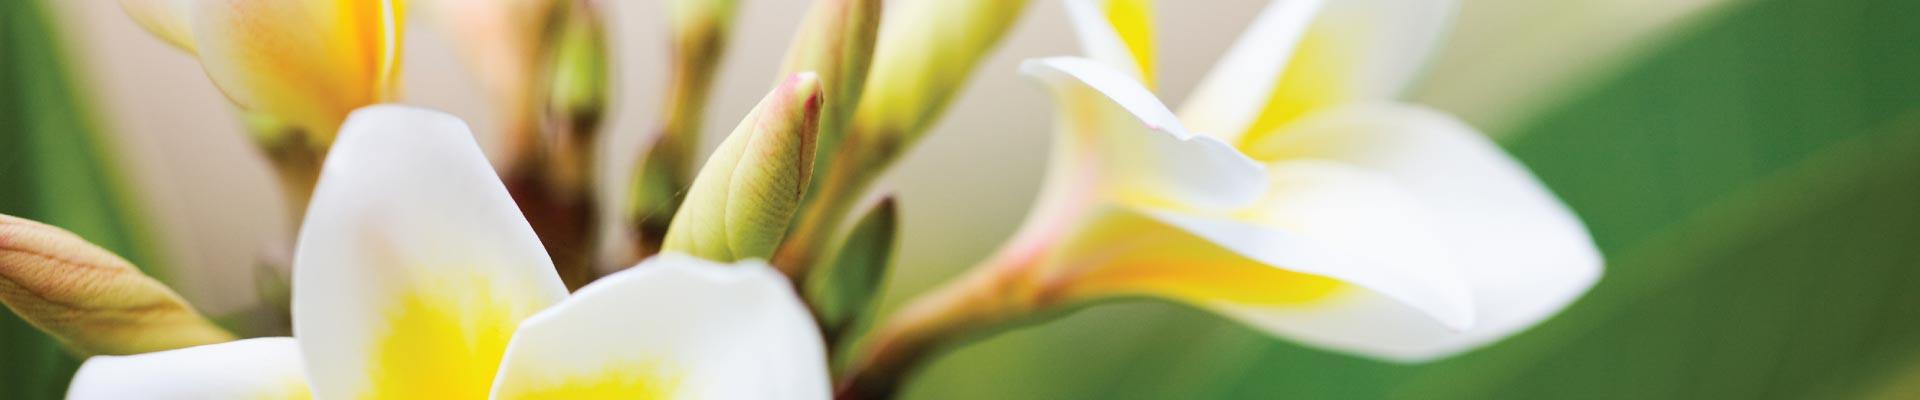 blossom-boutique-floral-banner-1